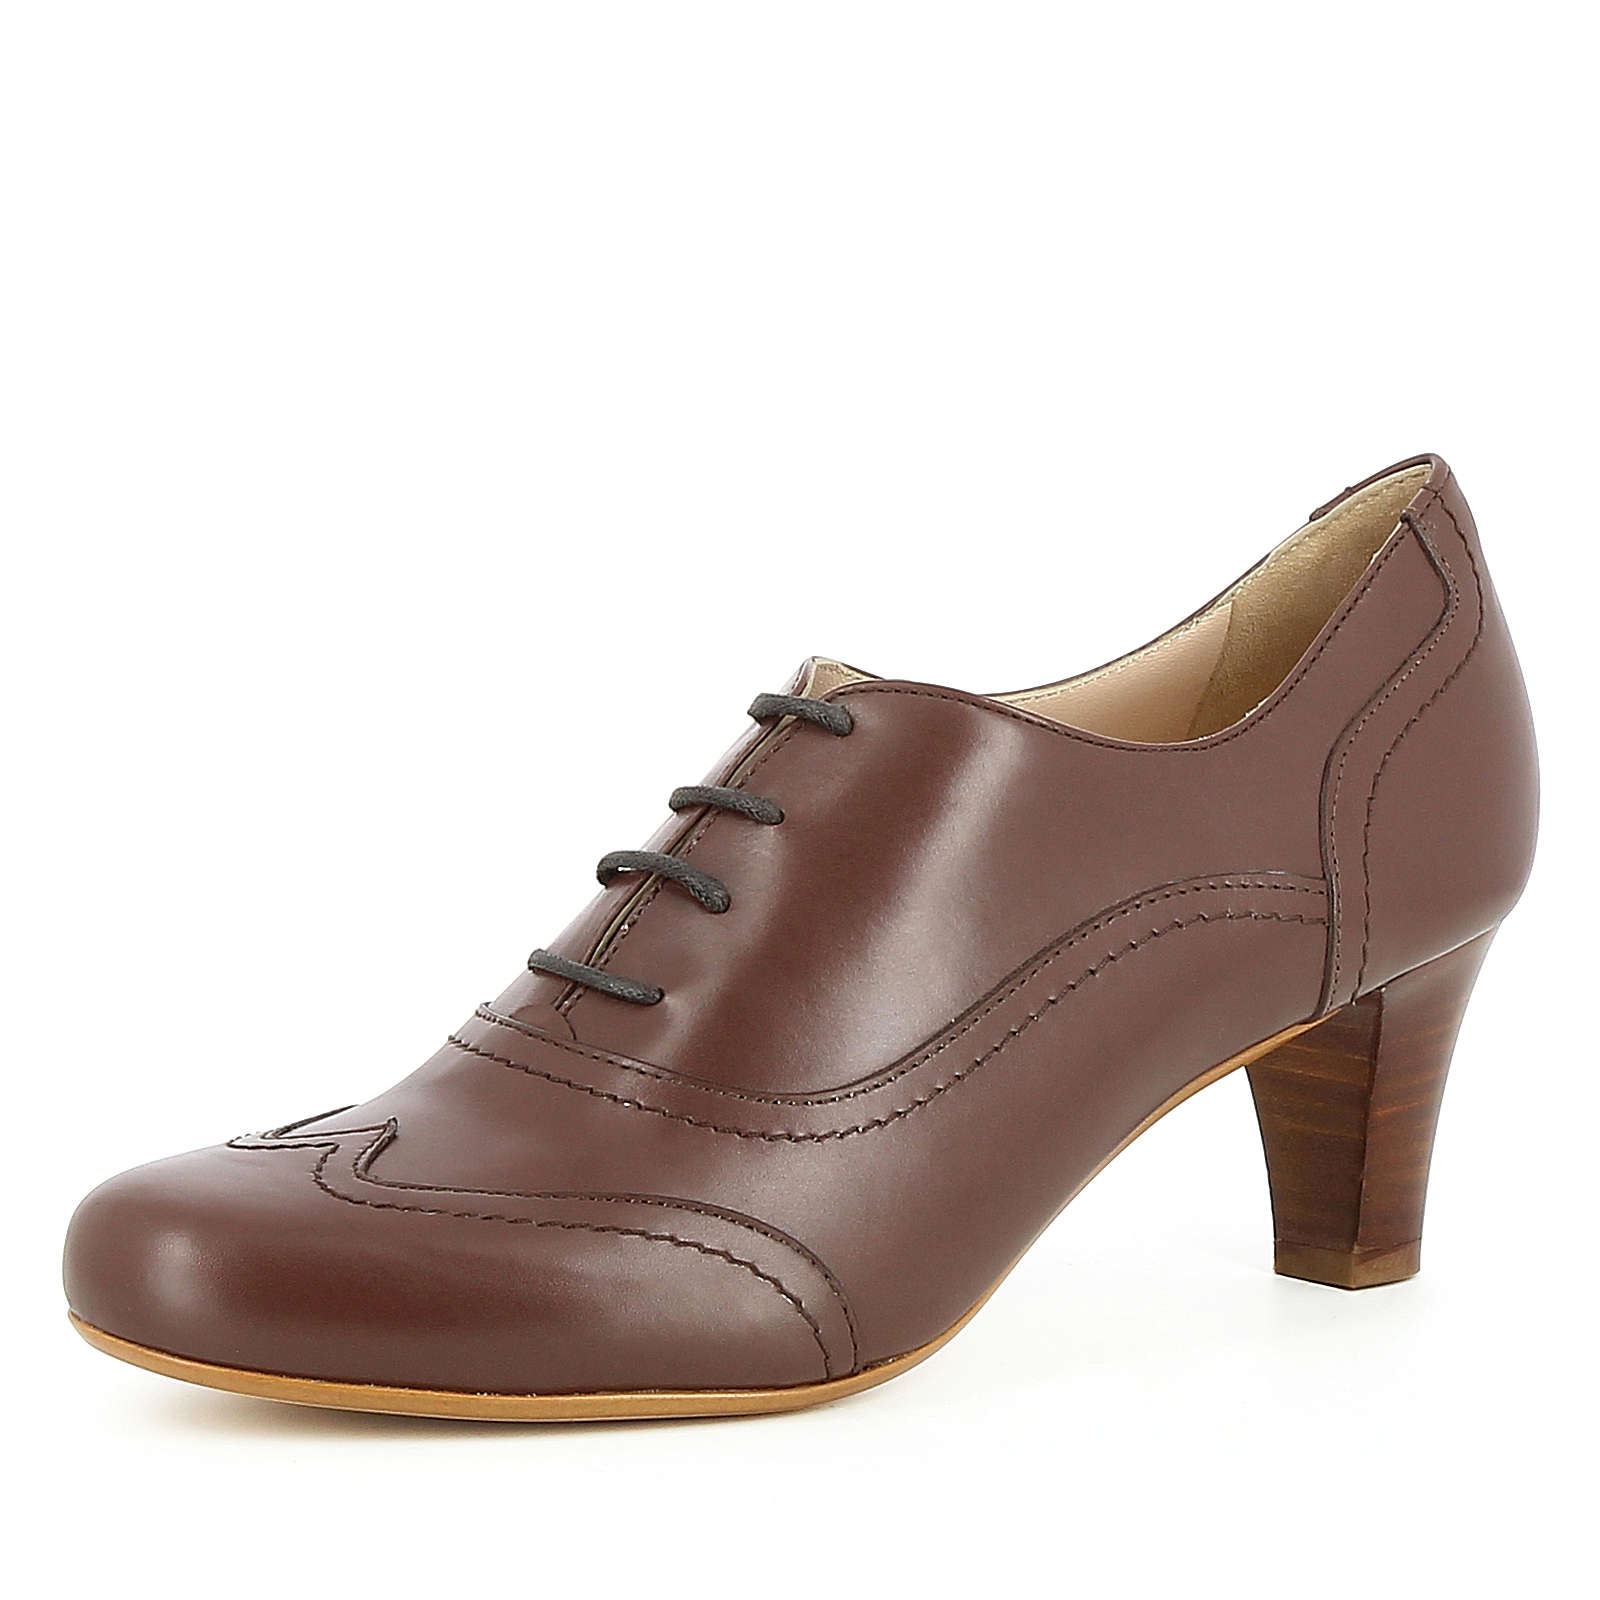 Evita Shoes Damen Pumps GIUSY Schnürpumps braun Damen Gr. 38